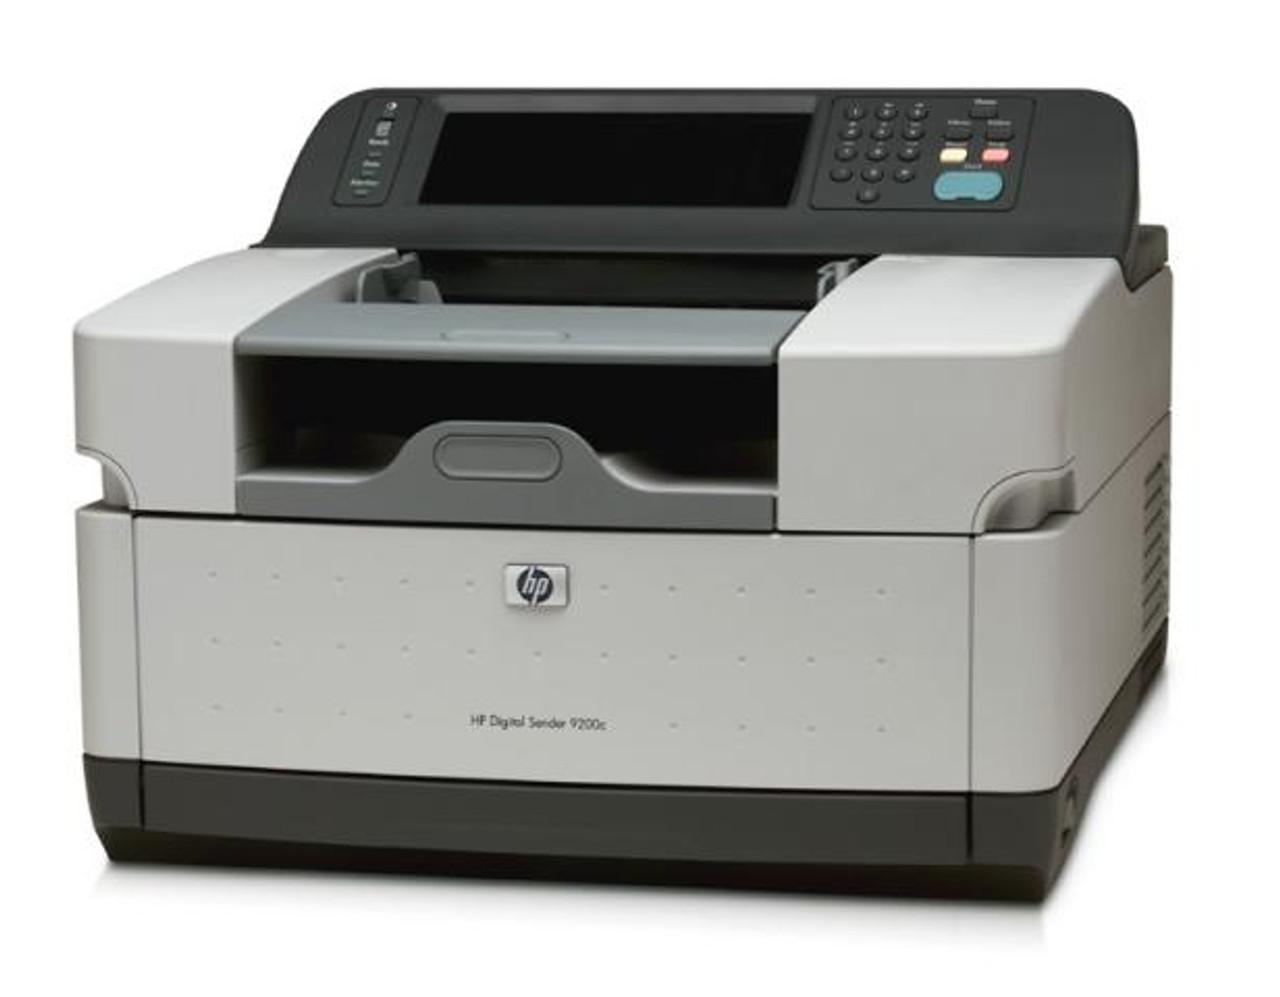 HP Digital Sender 9200C - 600 dpi x 600 dpi - Document scanner